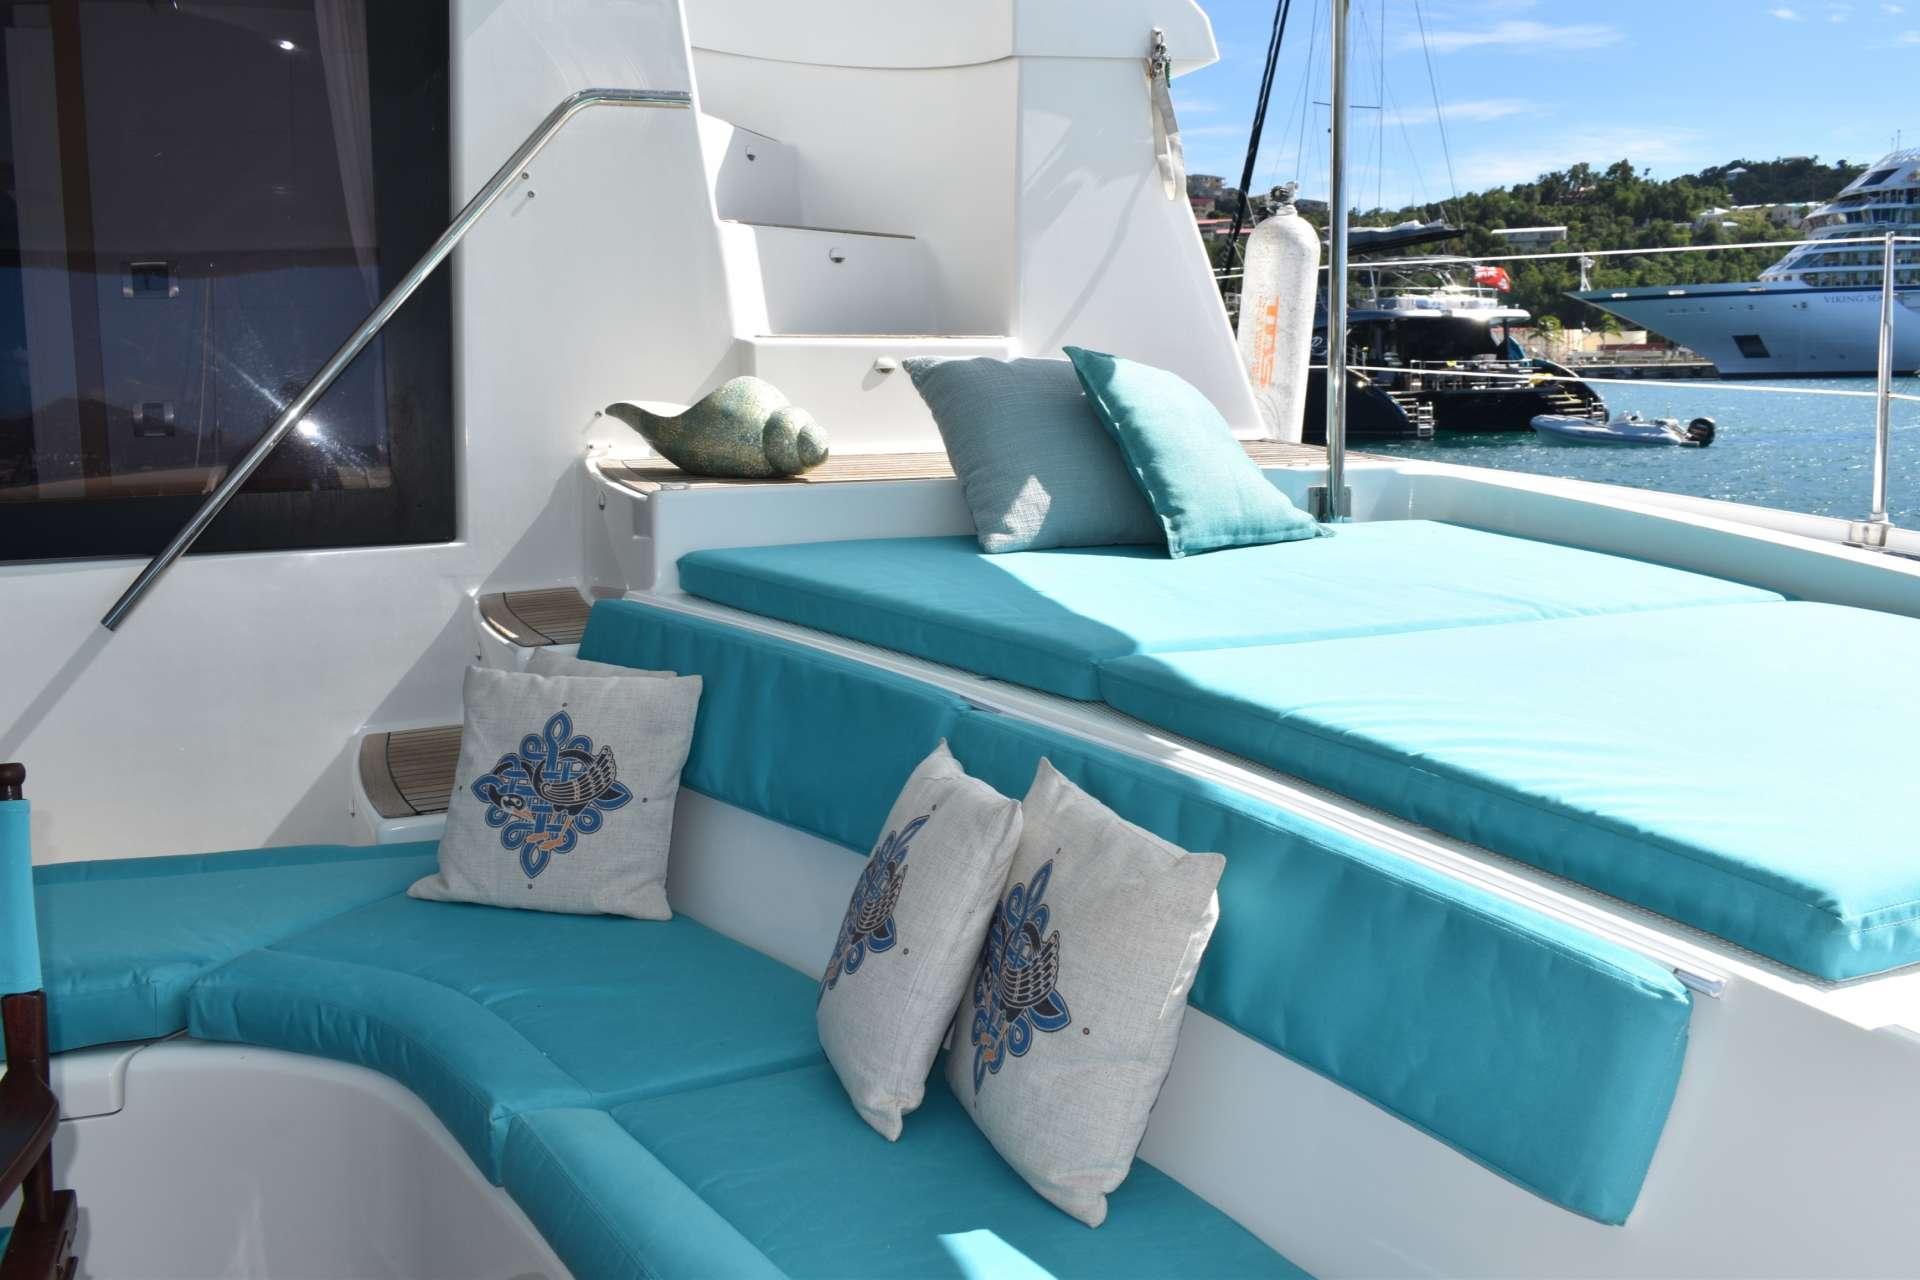 Image of LIR yacht #17